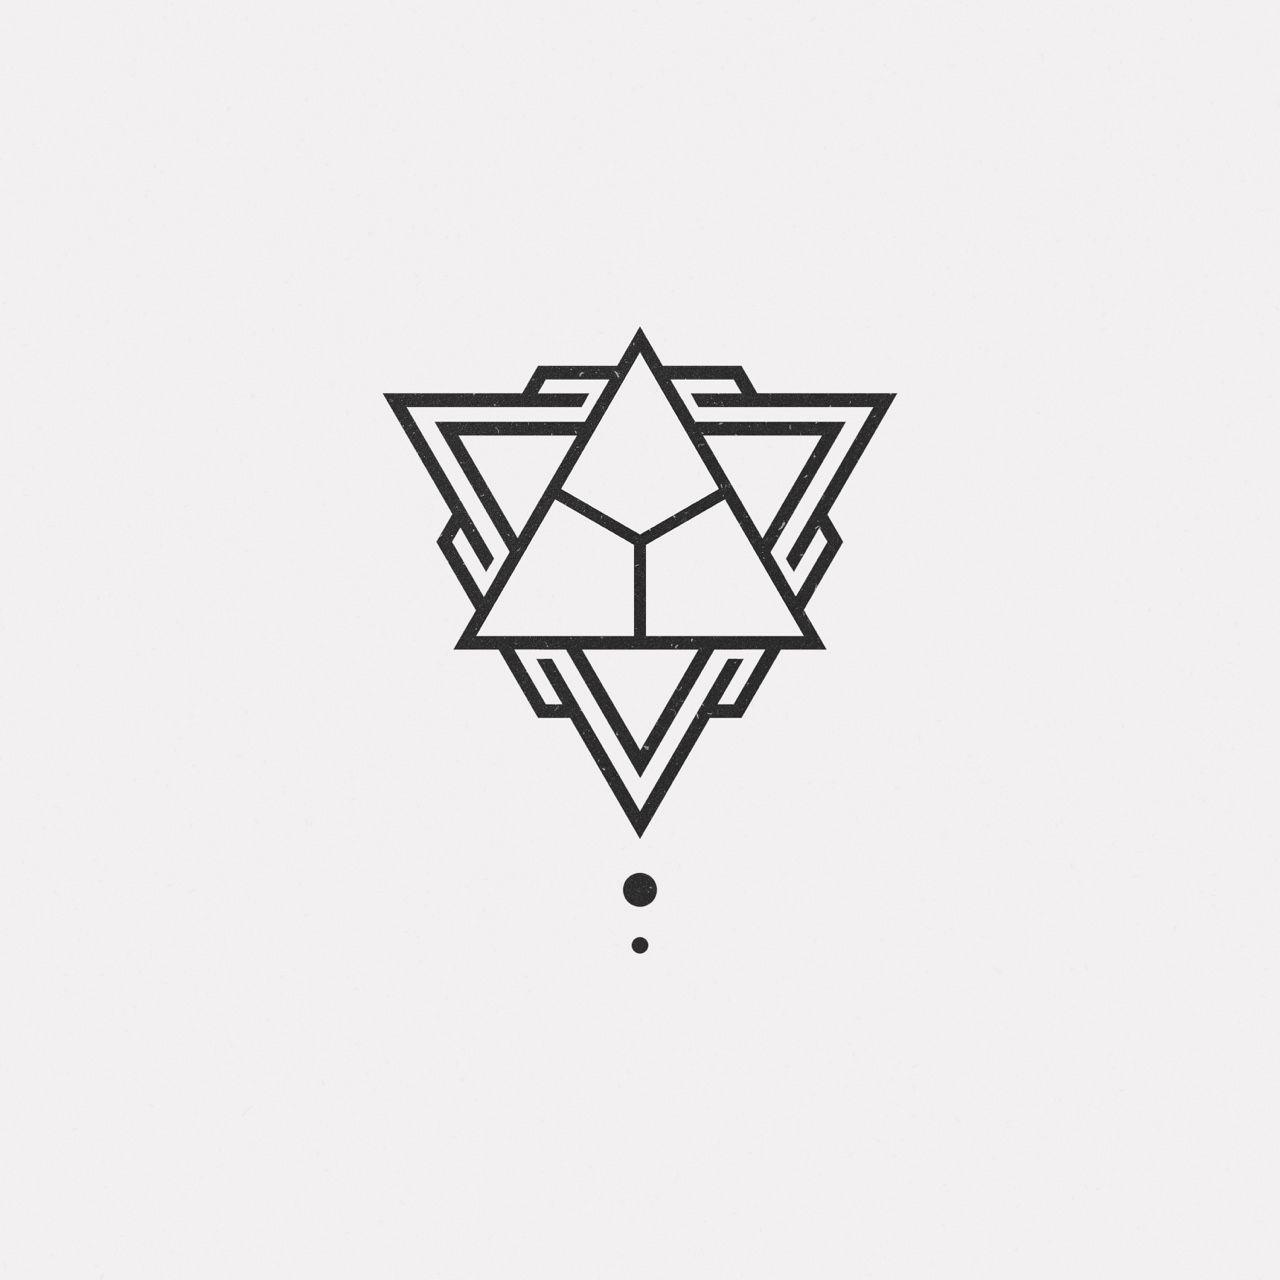 De16 779 A New Geometric Design Every Day Geometric Tattoo